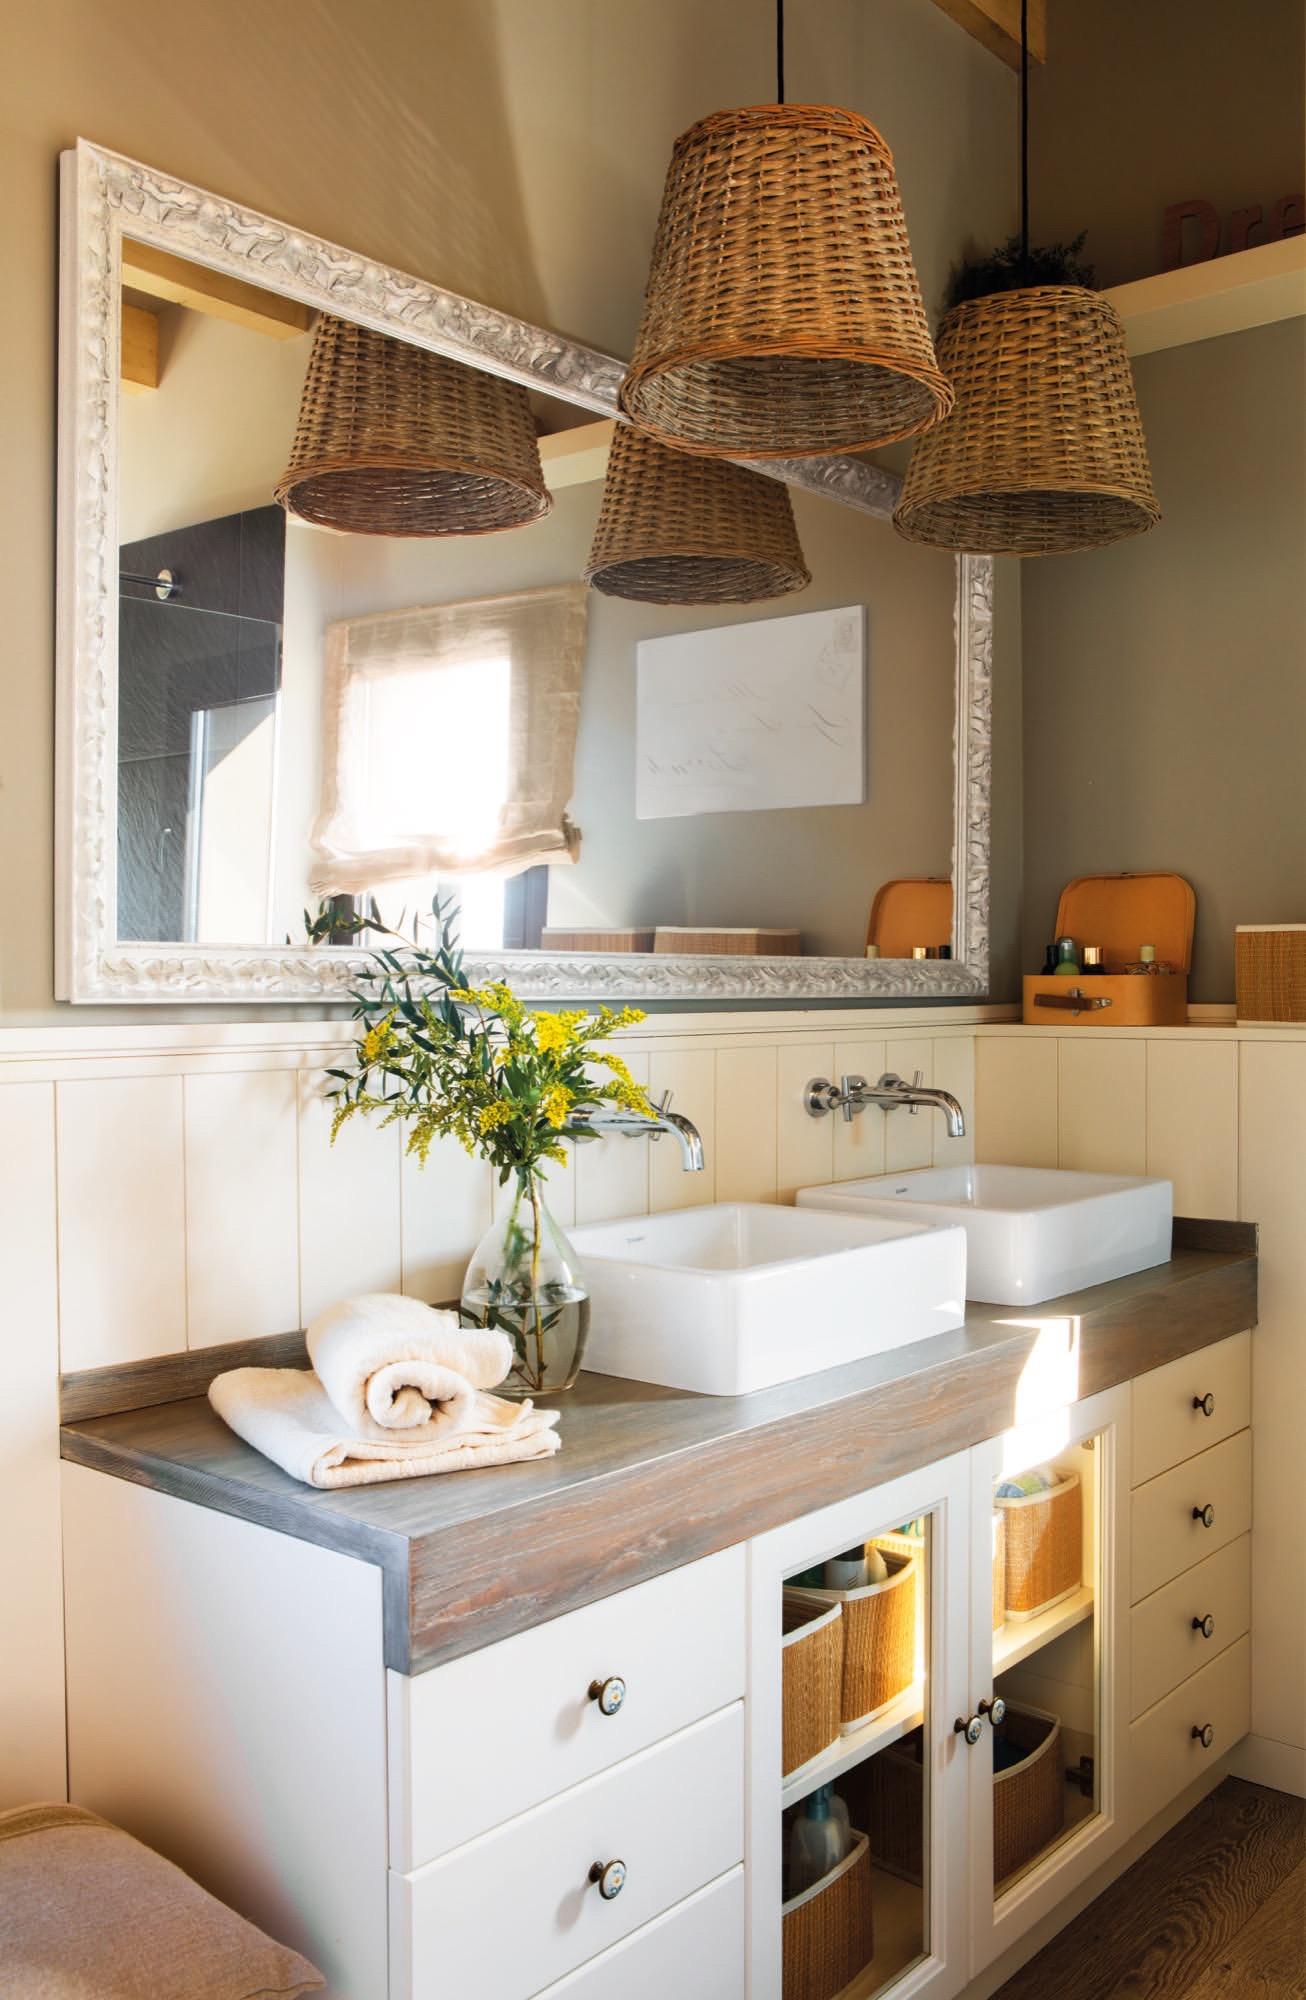 Una casa a la medida de una familia numerosa - Lampara espejo bano ...